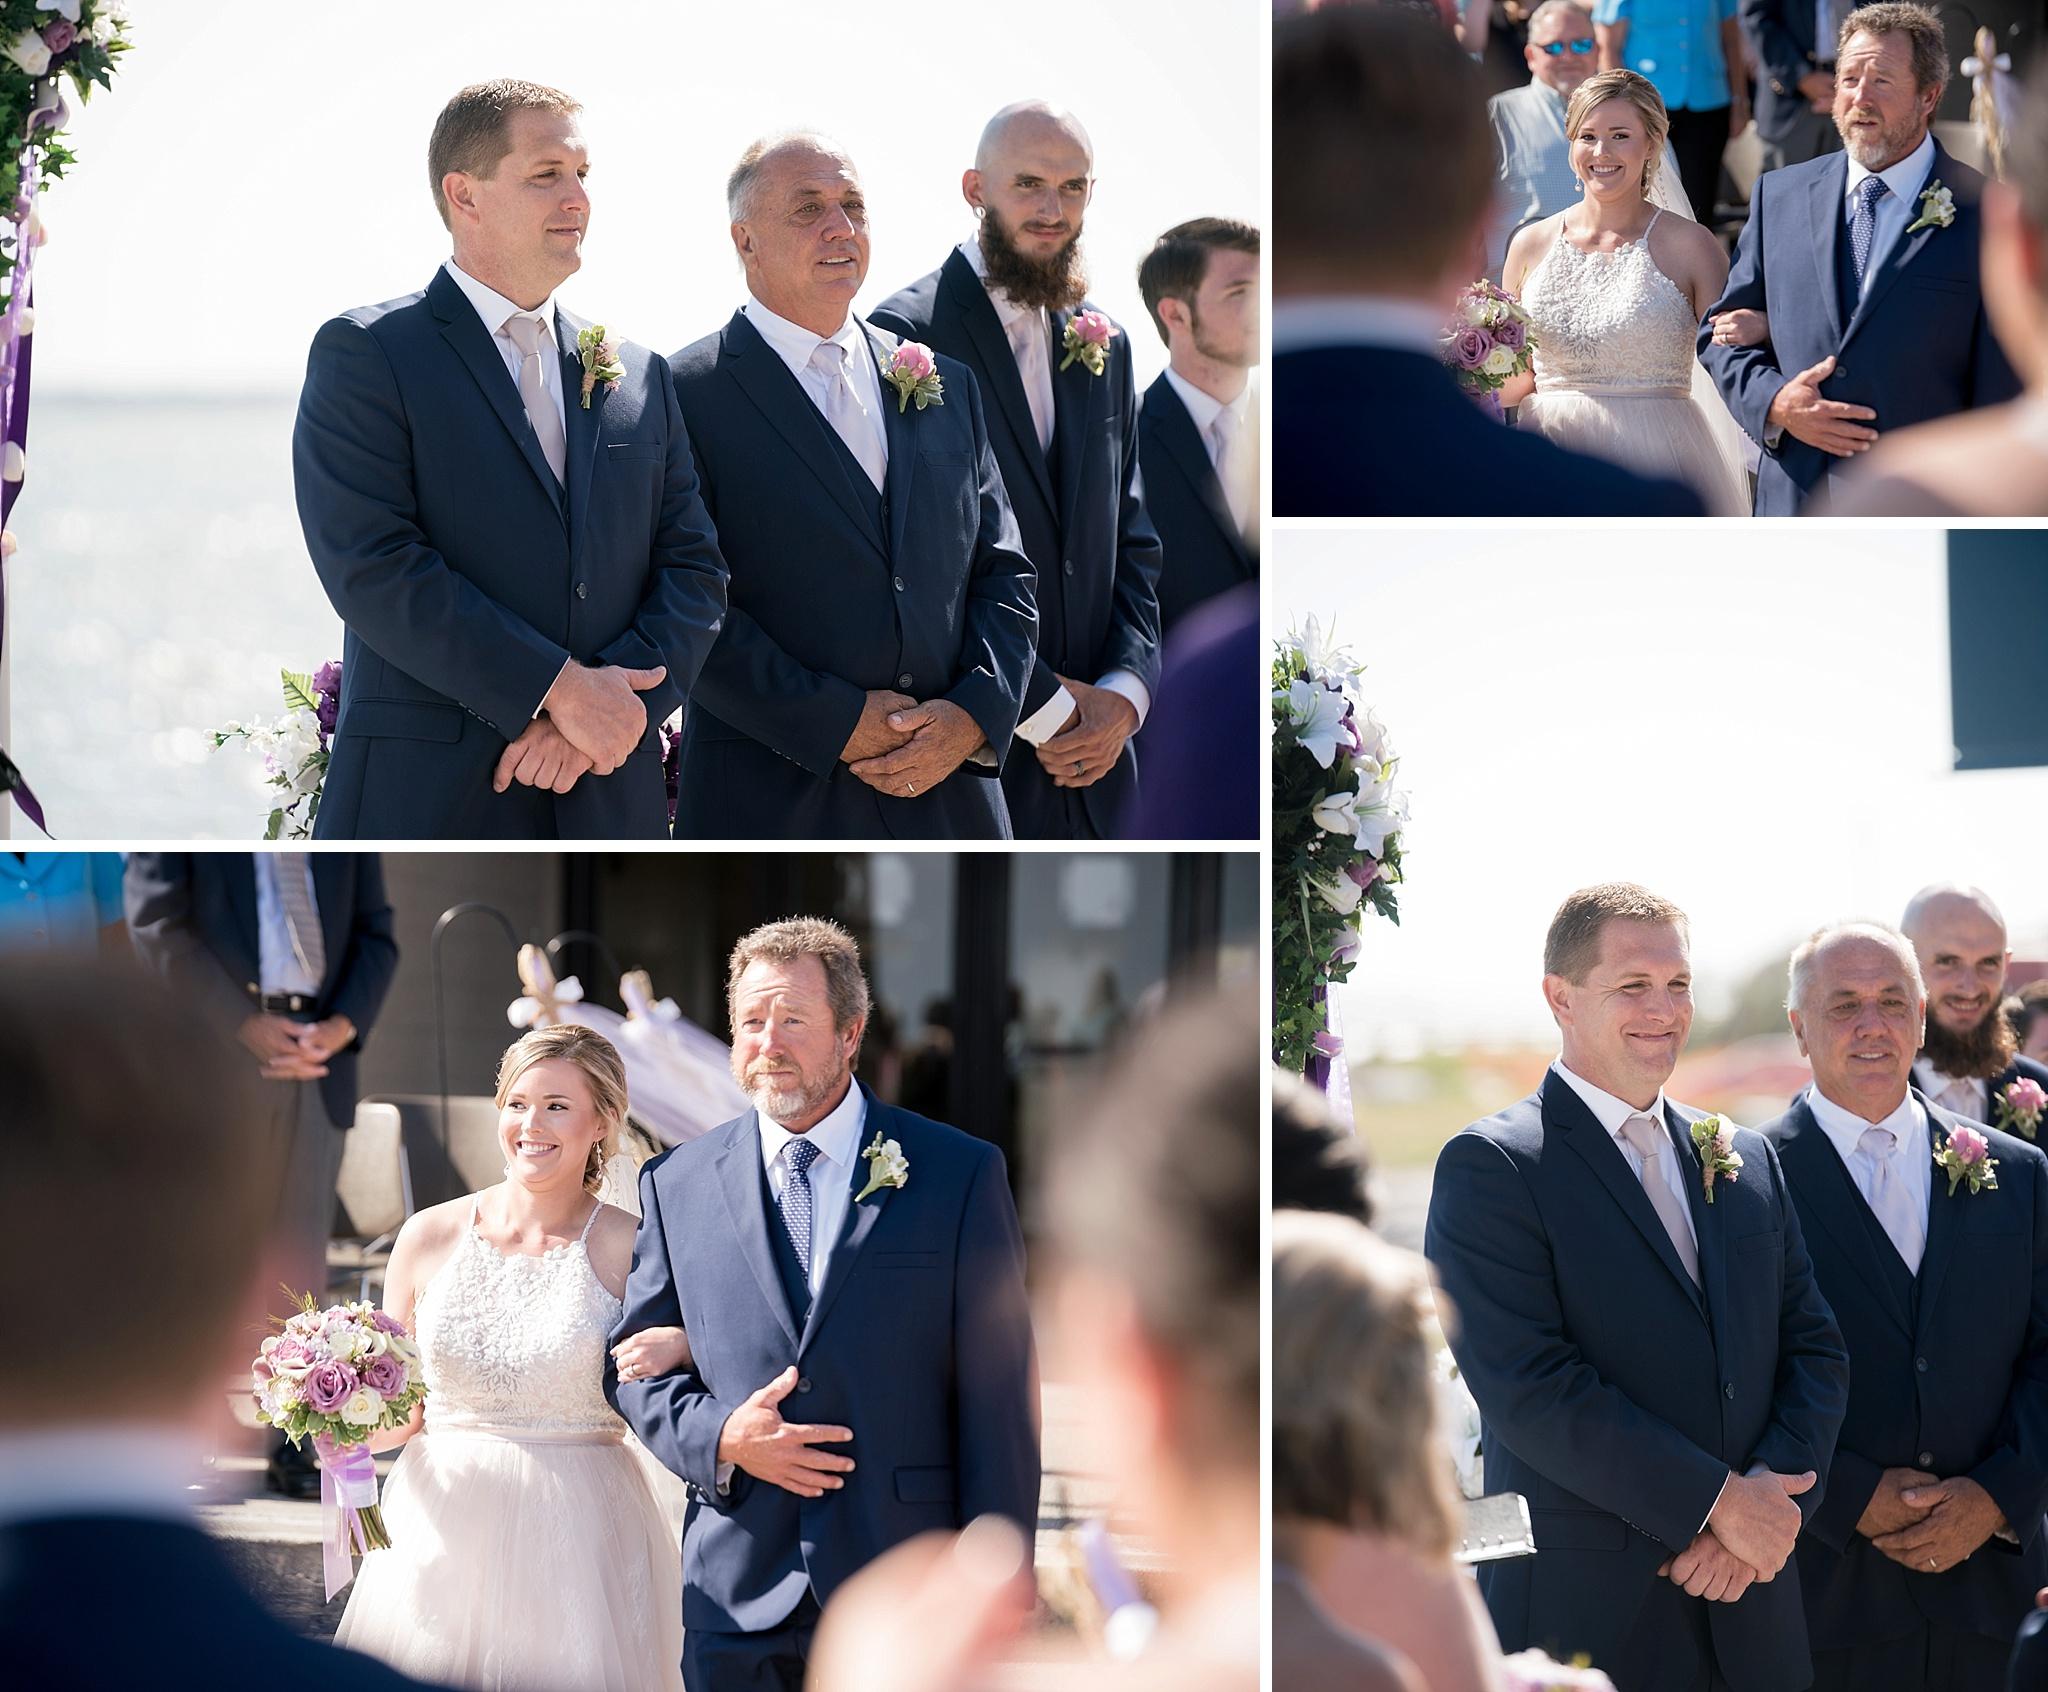 Crystal-Coast-Wedding-Photographer-022.jpg